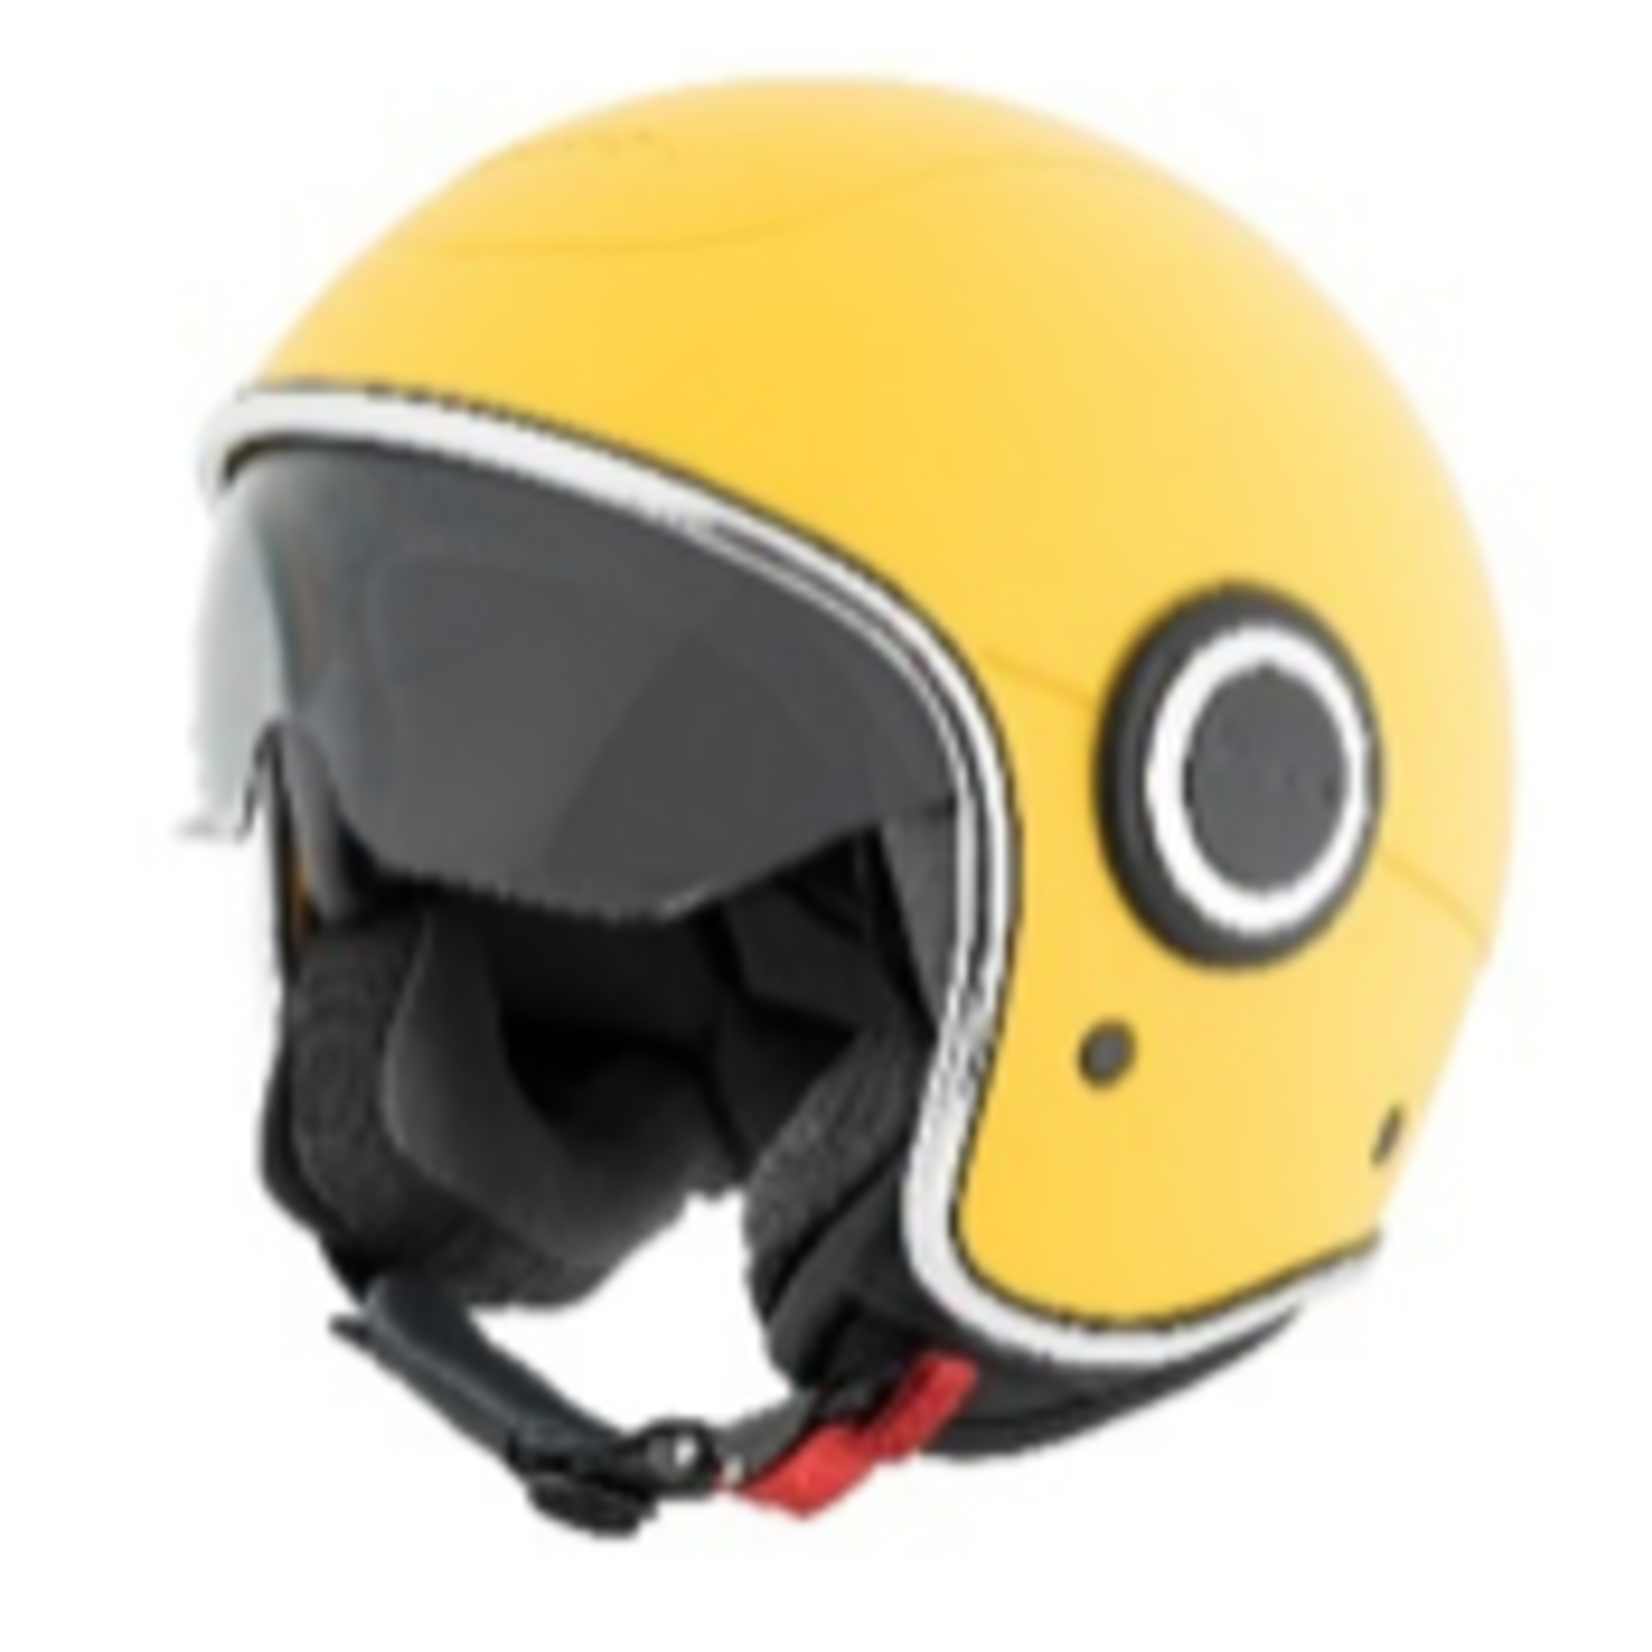 Apparel Helmet, Vespa VJ1 Yellow 974/A